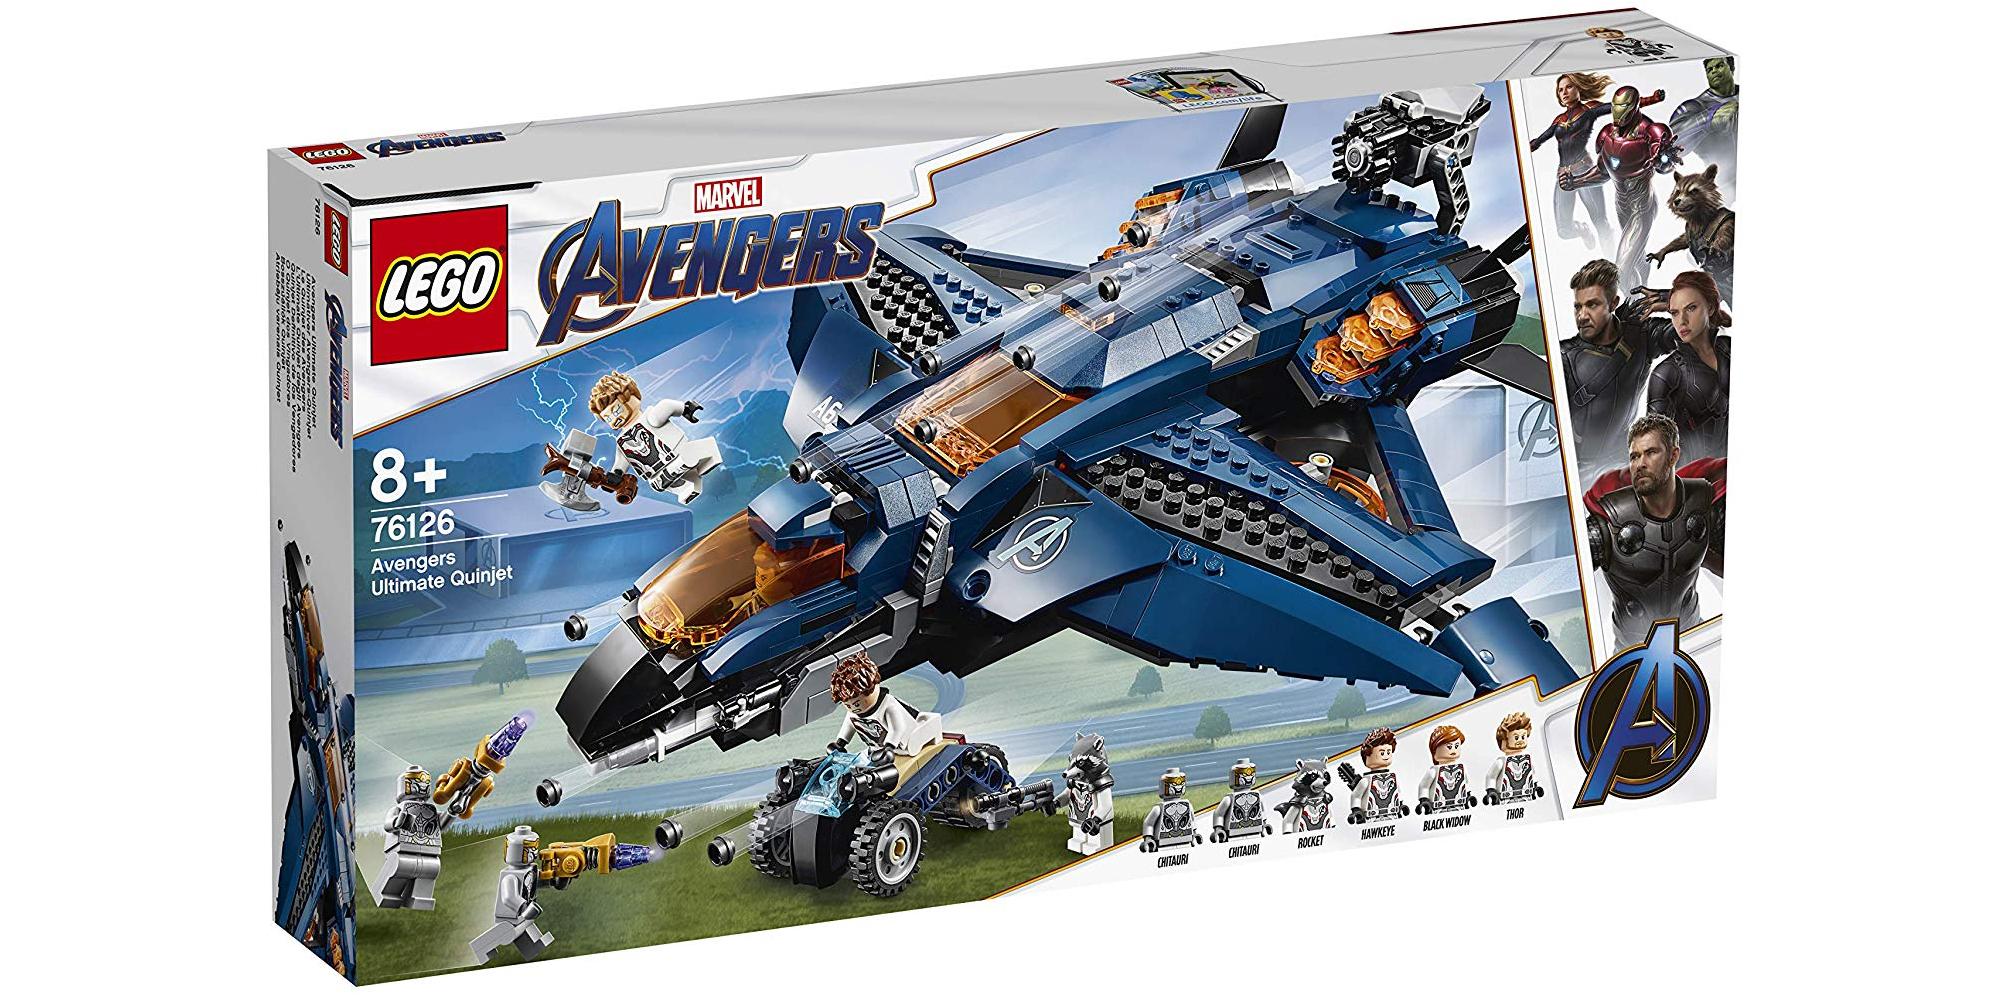 LEGO Avengers Quinjet